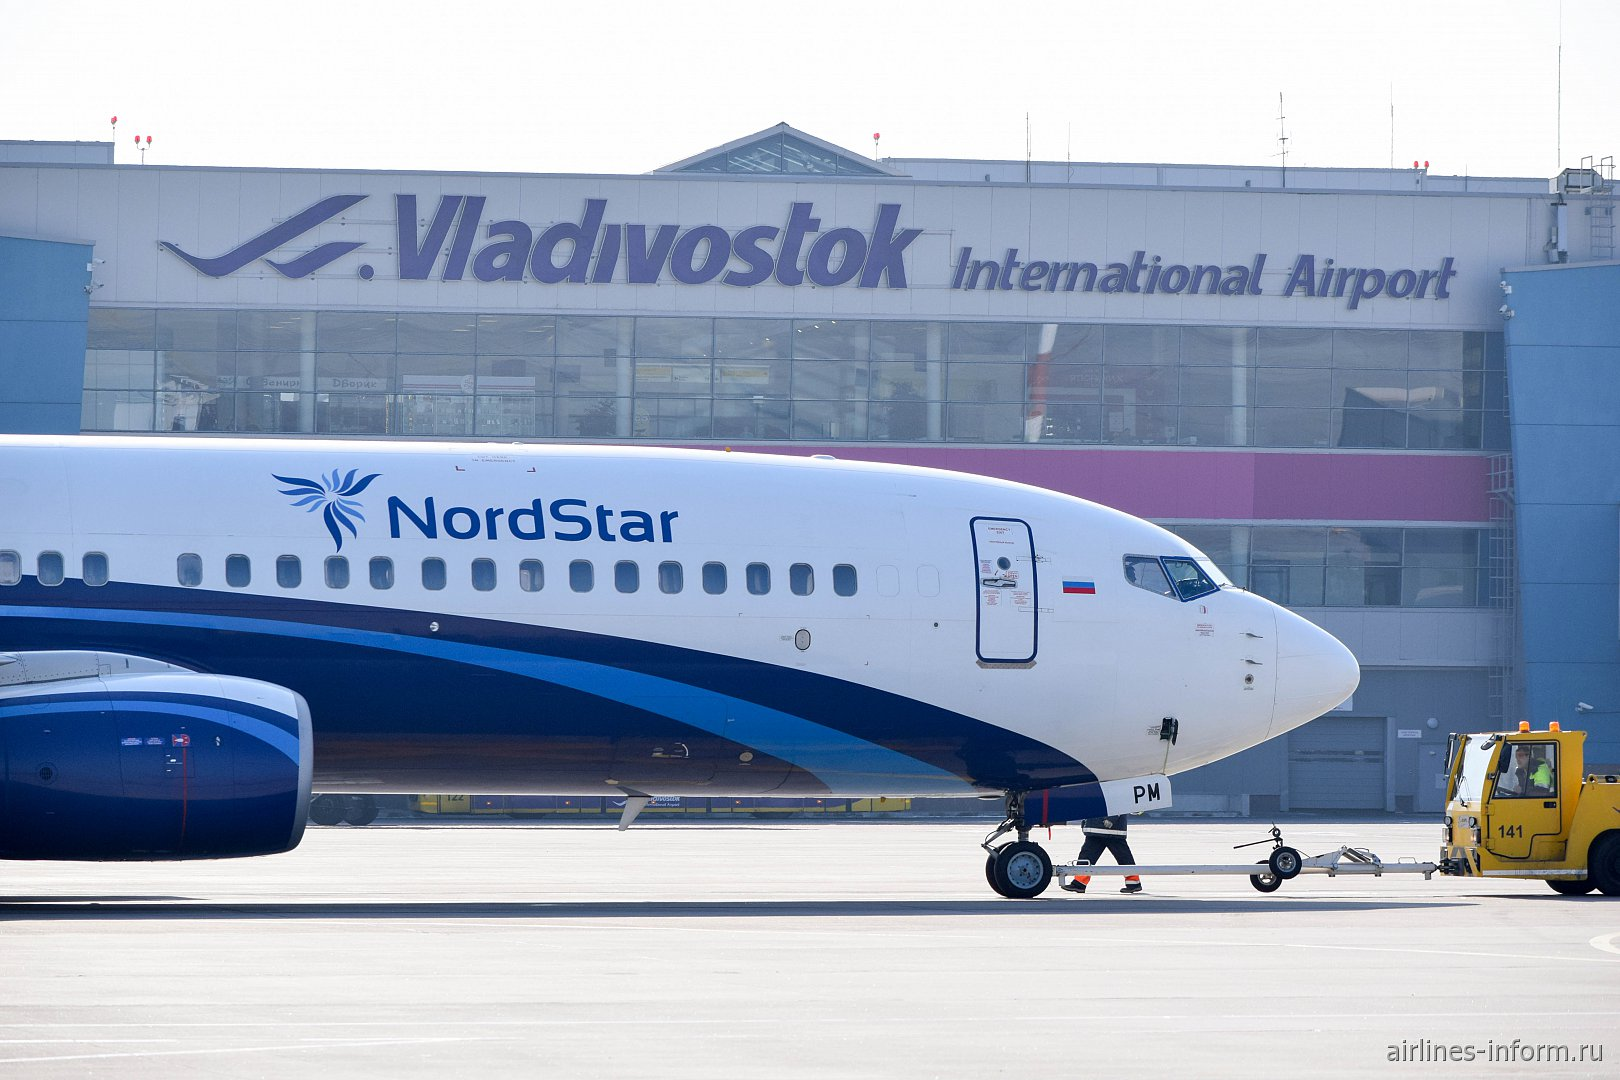 Боинг-737-800 авиакомпании NordStar в аэропорту Владивостока